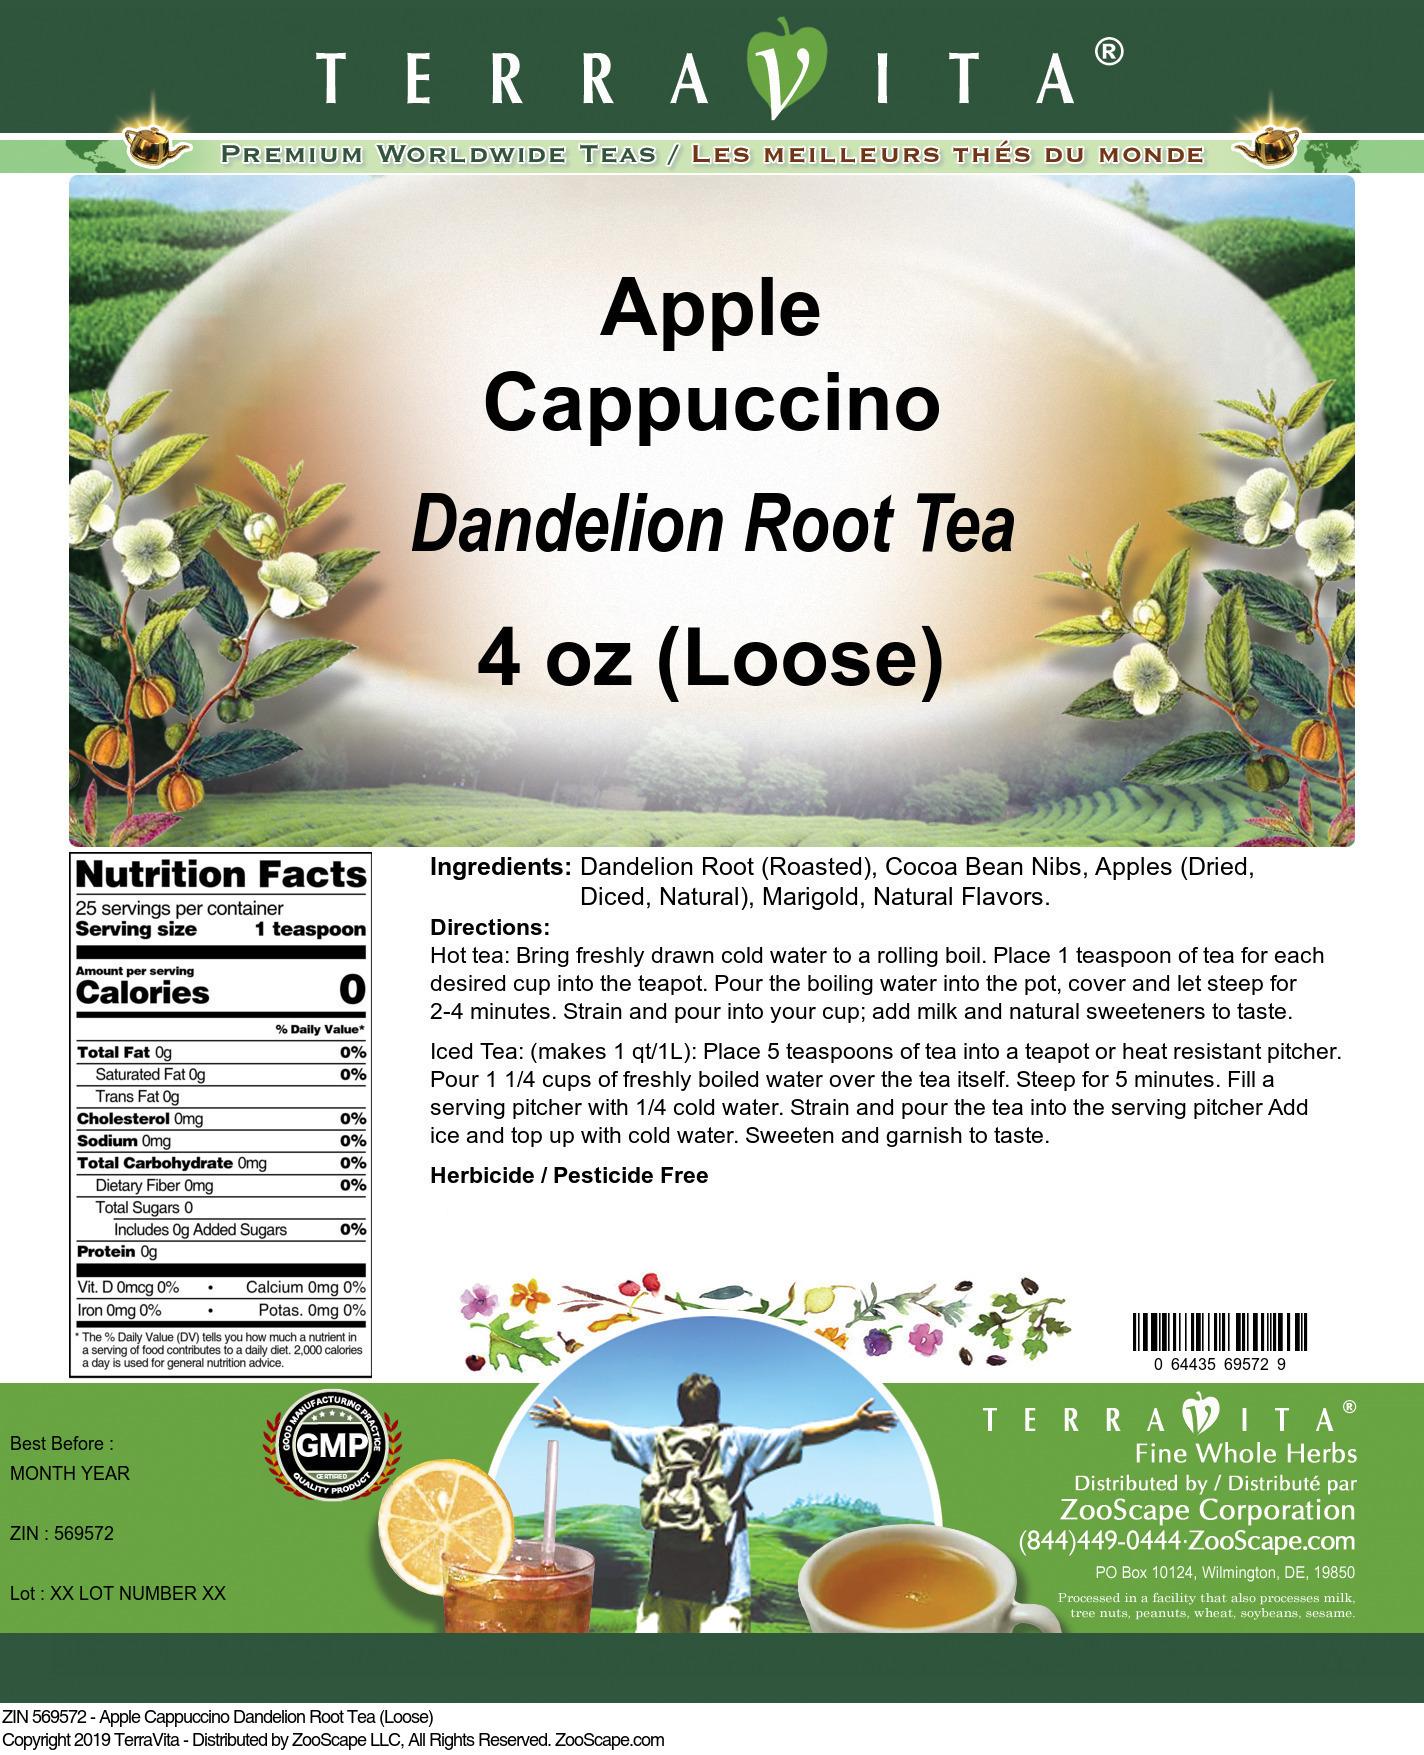 Apple Cappuccino Dandelion Root Tea (Loose)